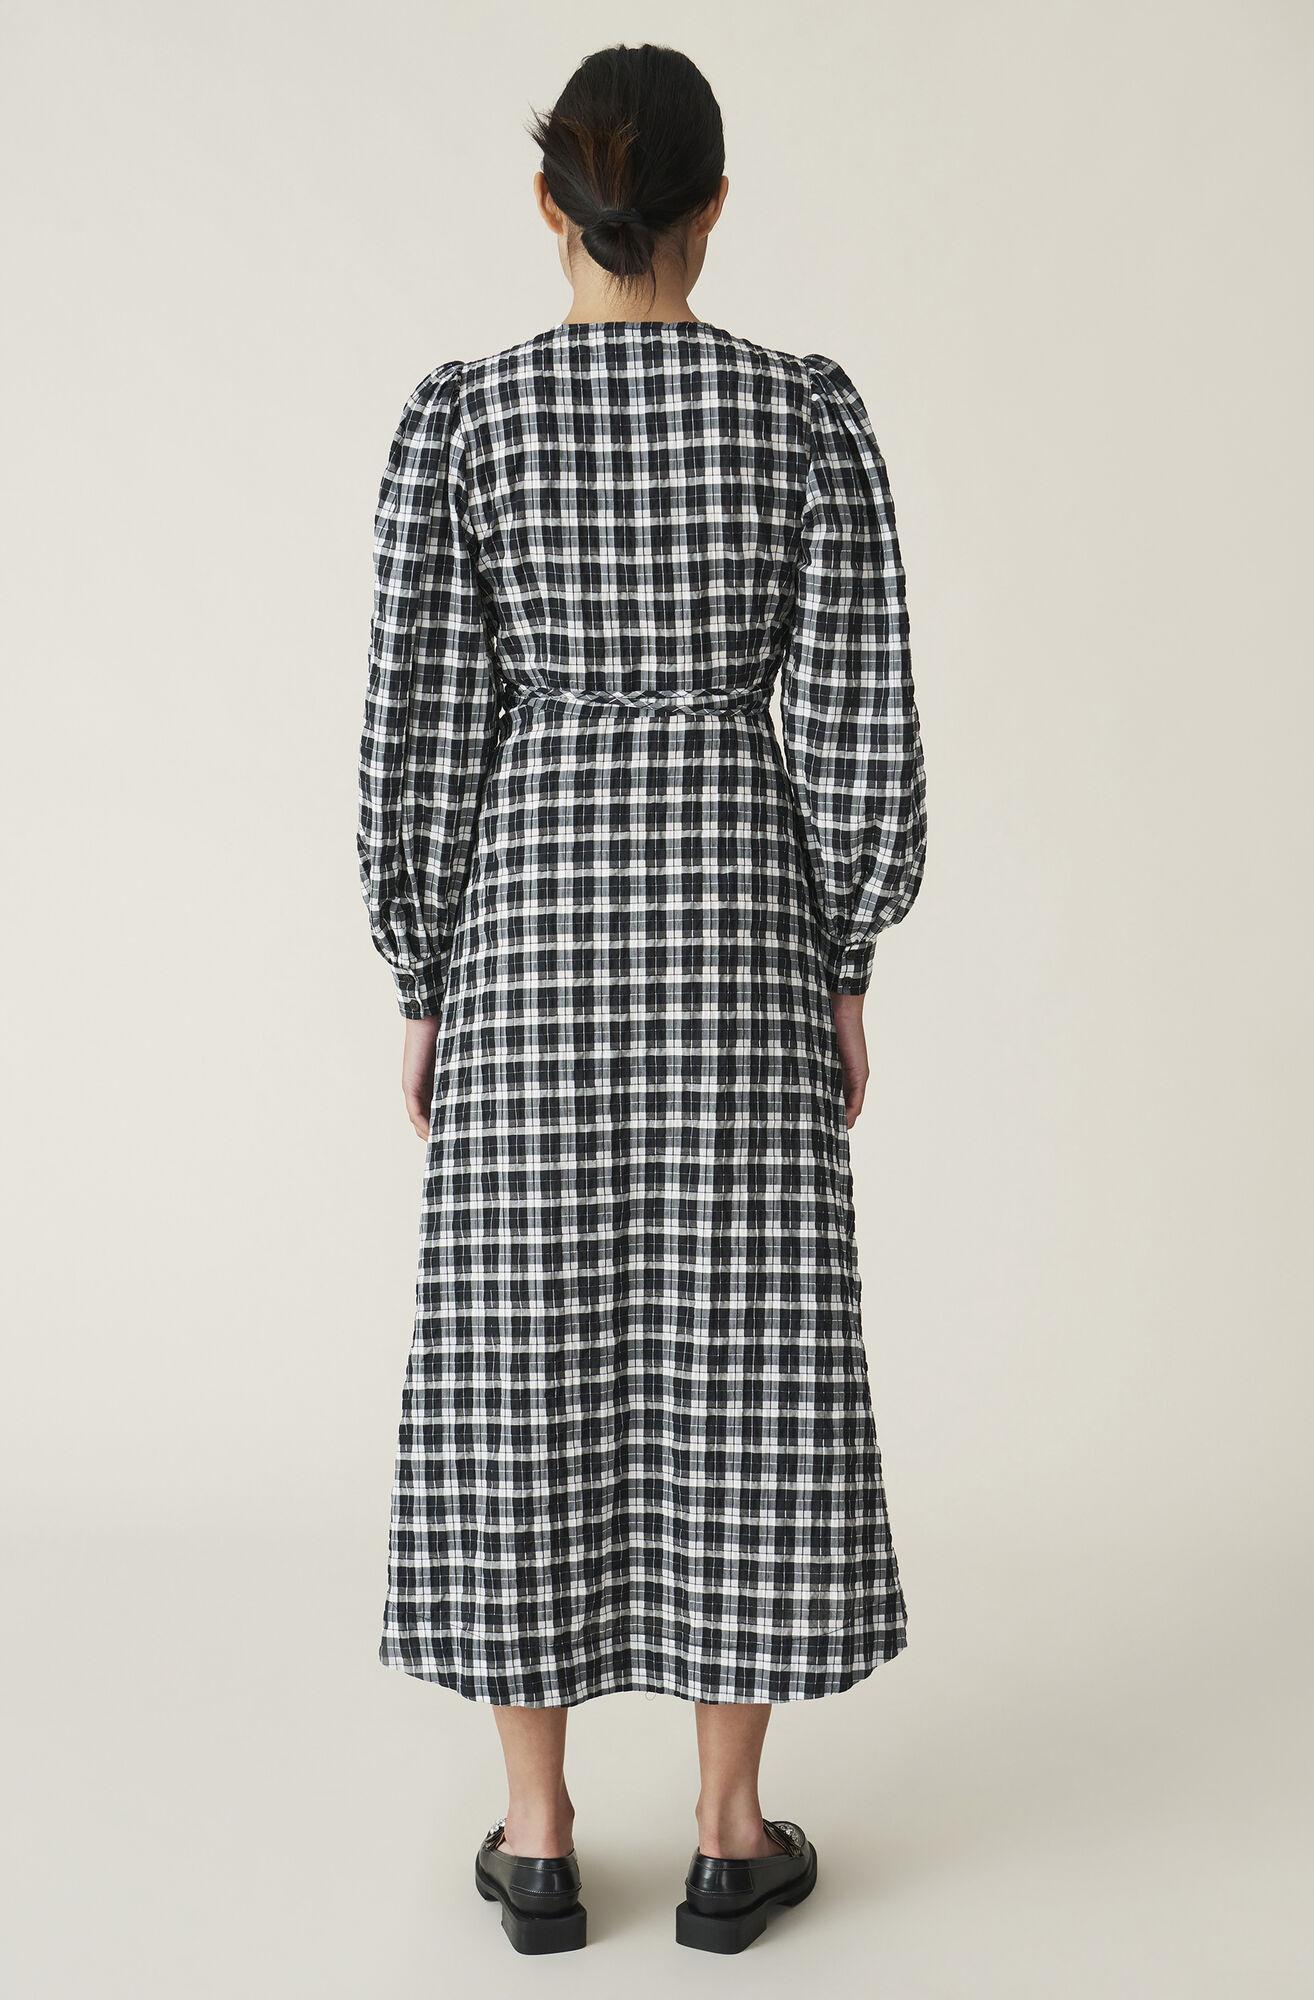 Ganni Us Seersucker Check Wrap Dress 118 00 Usd Shop Your